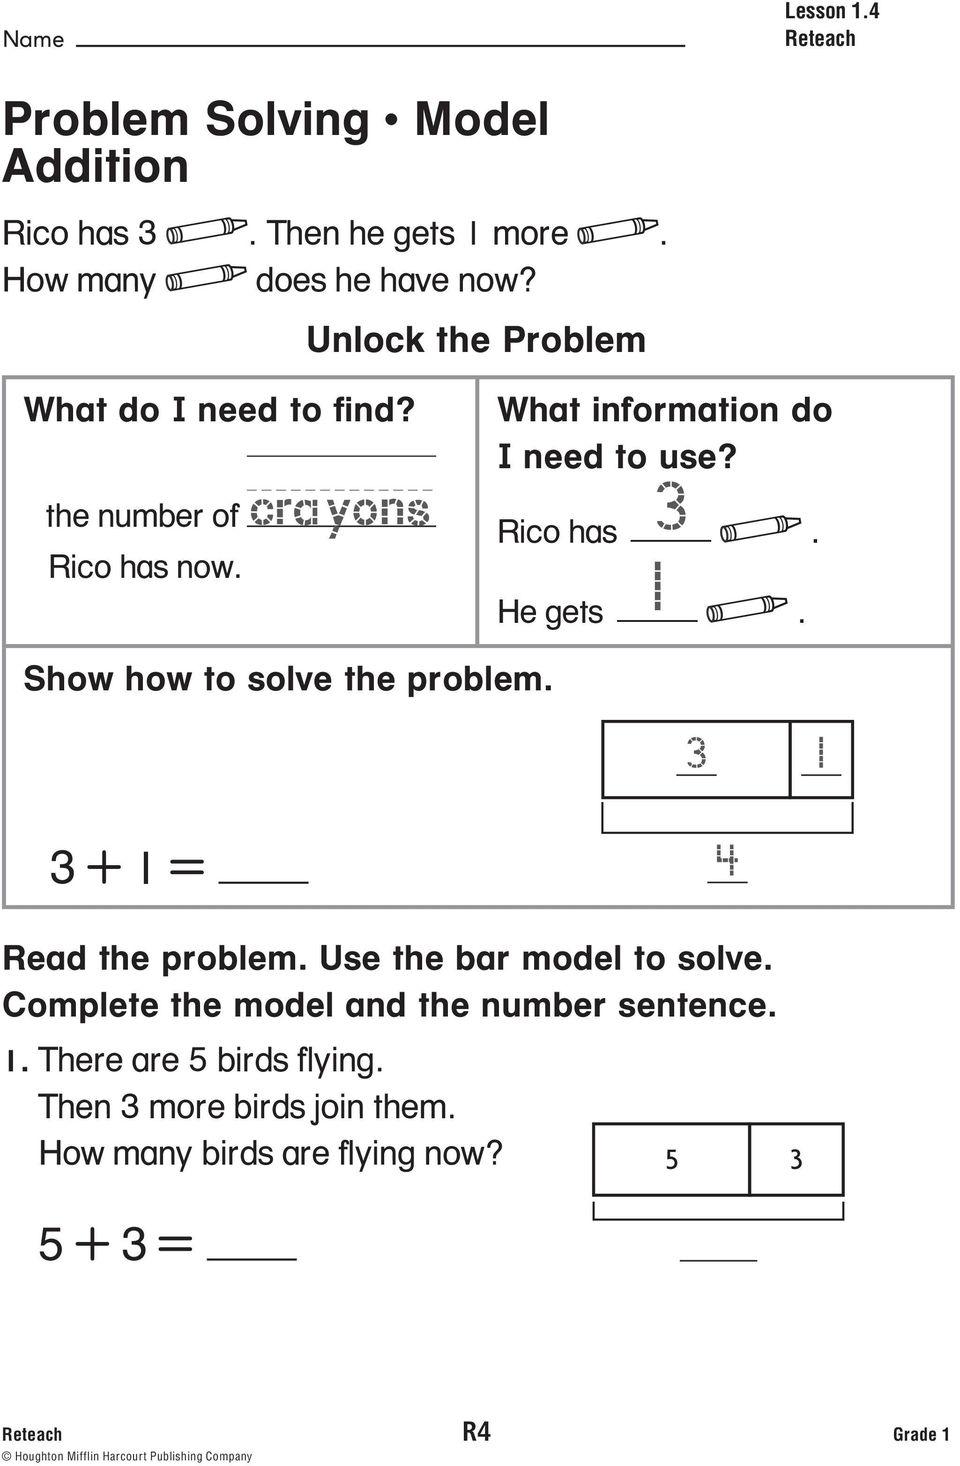 medium resolution of Reteach Book. Grade 1 PROVIDES. Tier 1 Intervention for Every Lesson - PDF  Free Download